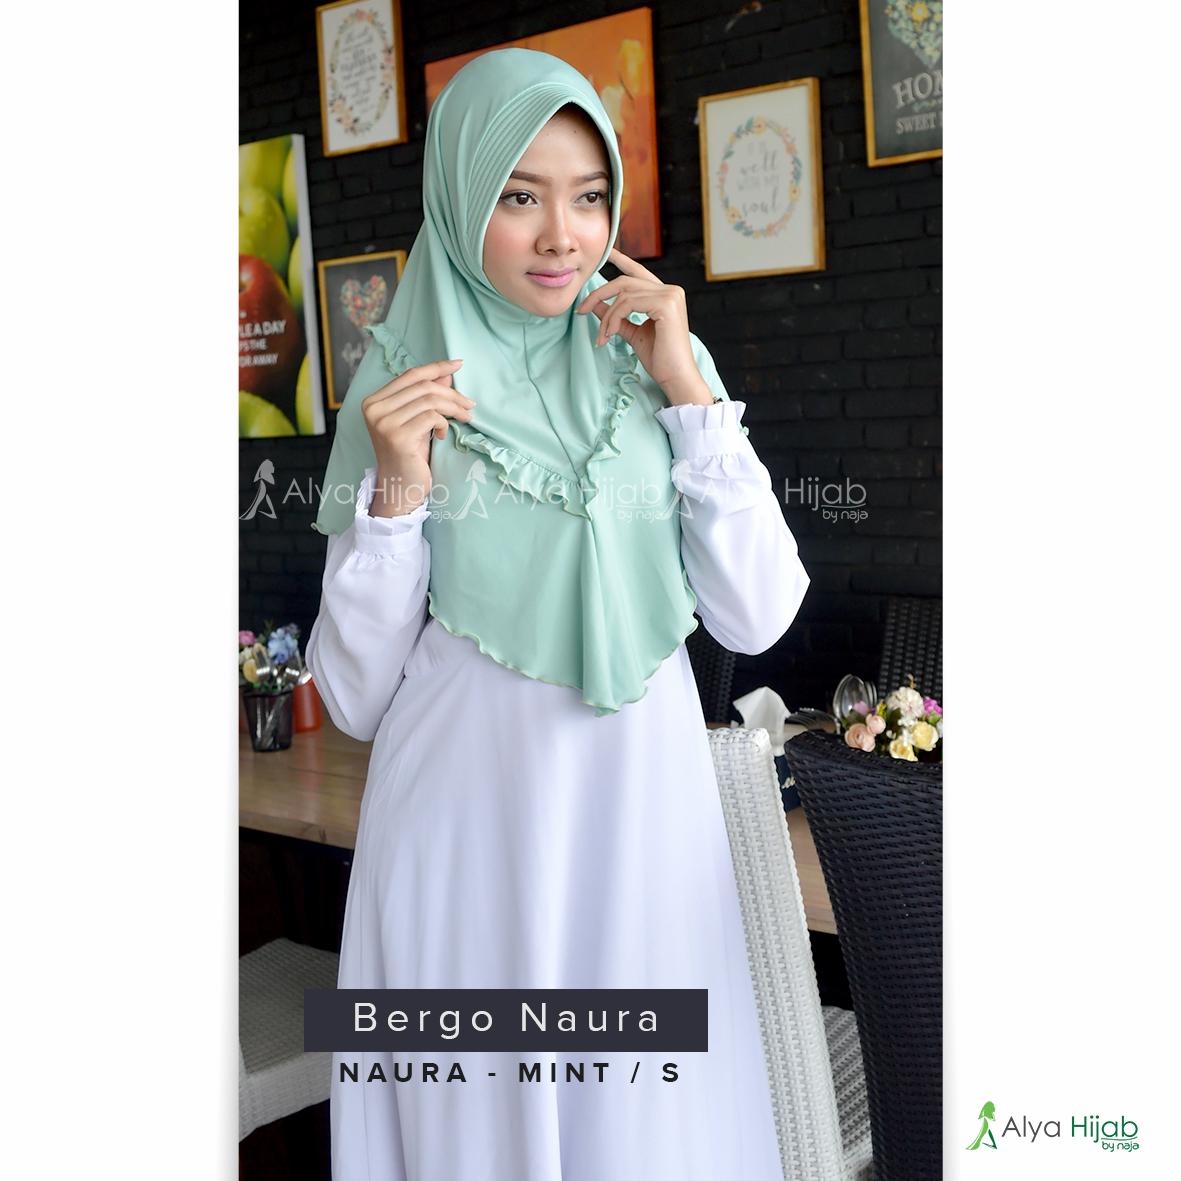 Jilbab Terbaru 2017 Bergo Naura Alya Hijab By Naja Jual